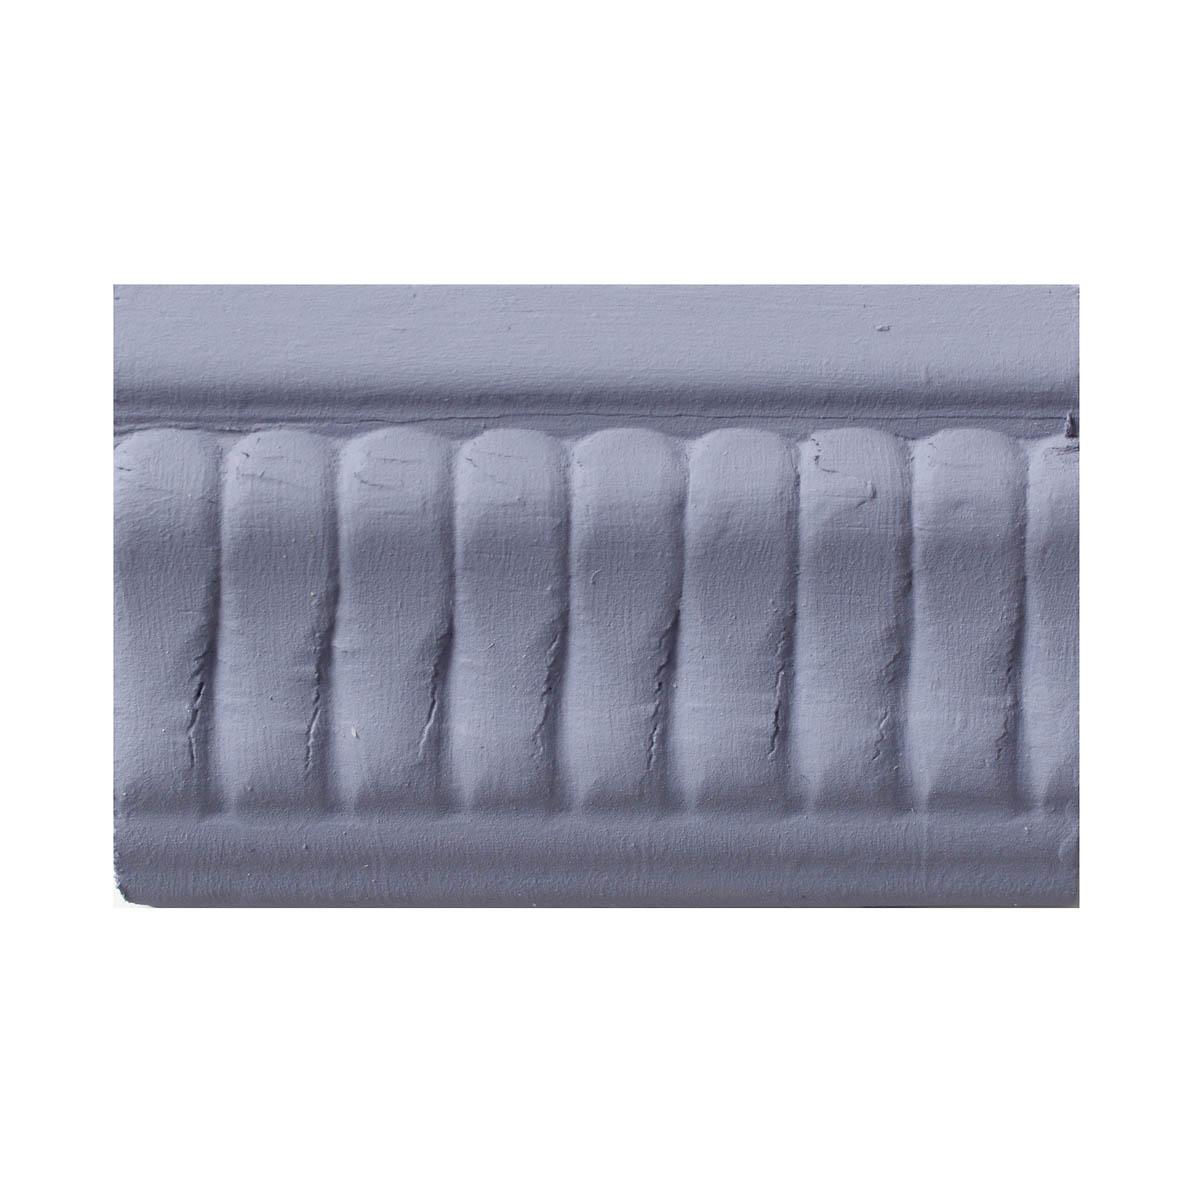 Waverly ® Inspirations Chalk Acrylic Paint - Lavender, 8 oz. - 60707E